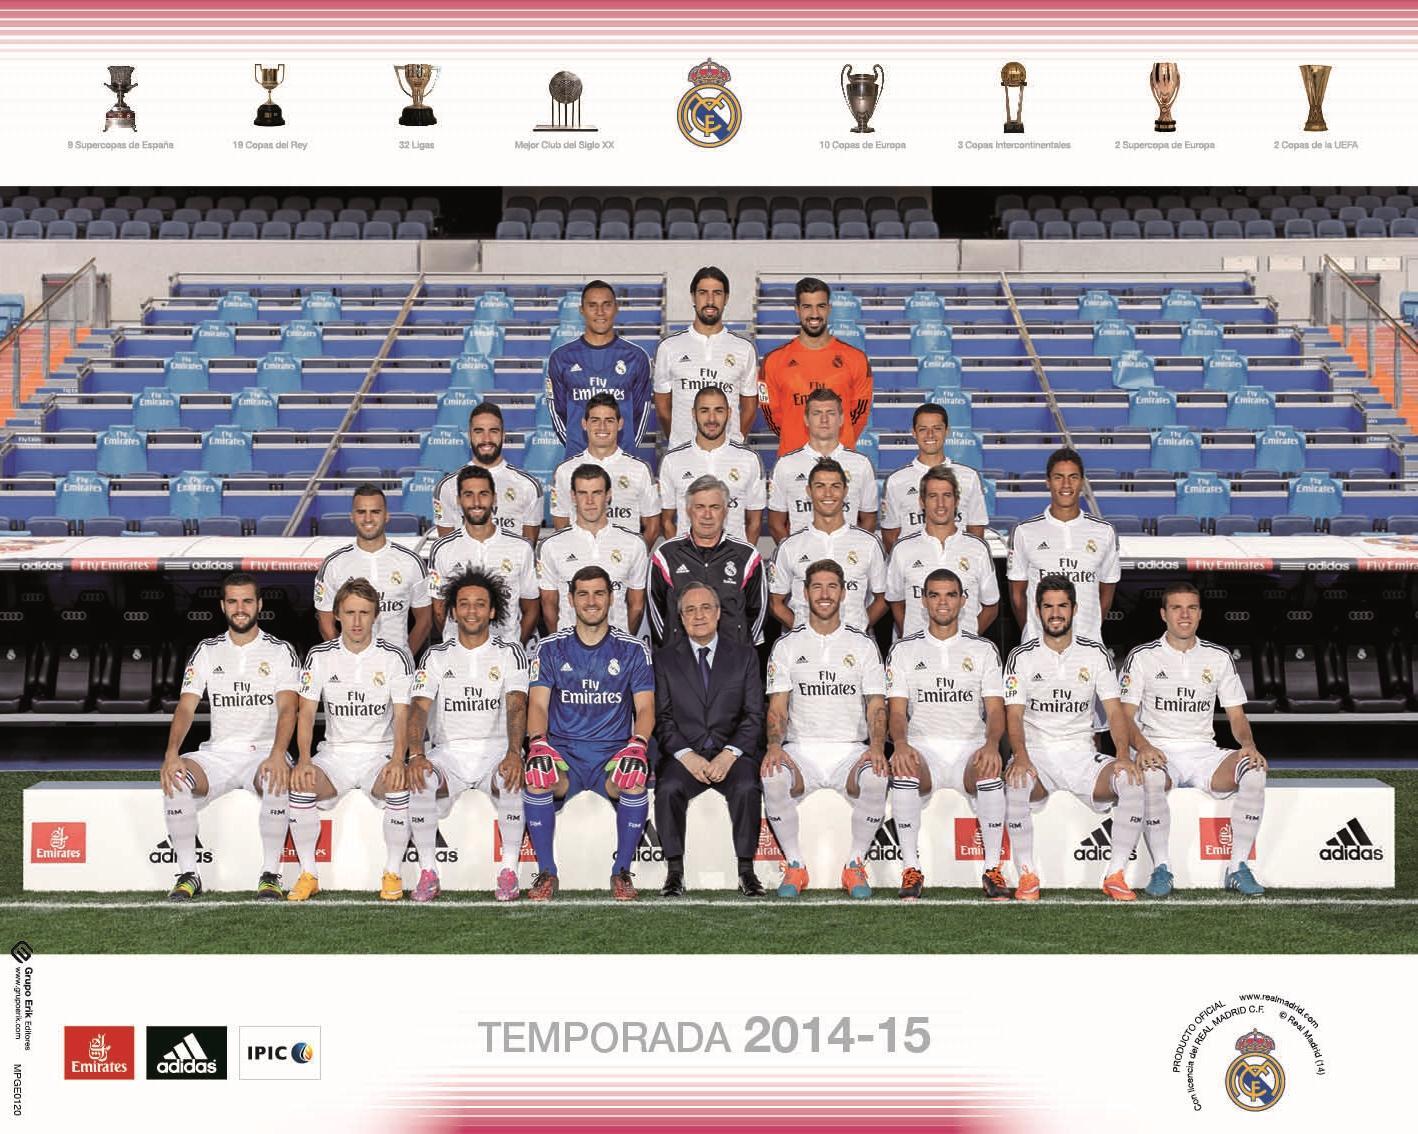 Hilo del Real Madrid Mini-poster-real-madrid-plantilla-20114-2015